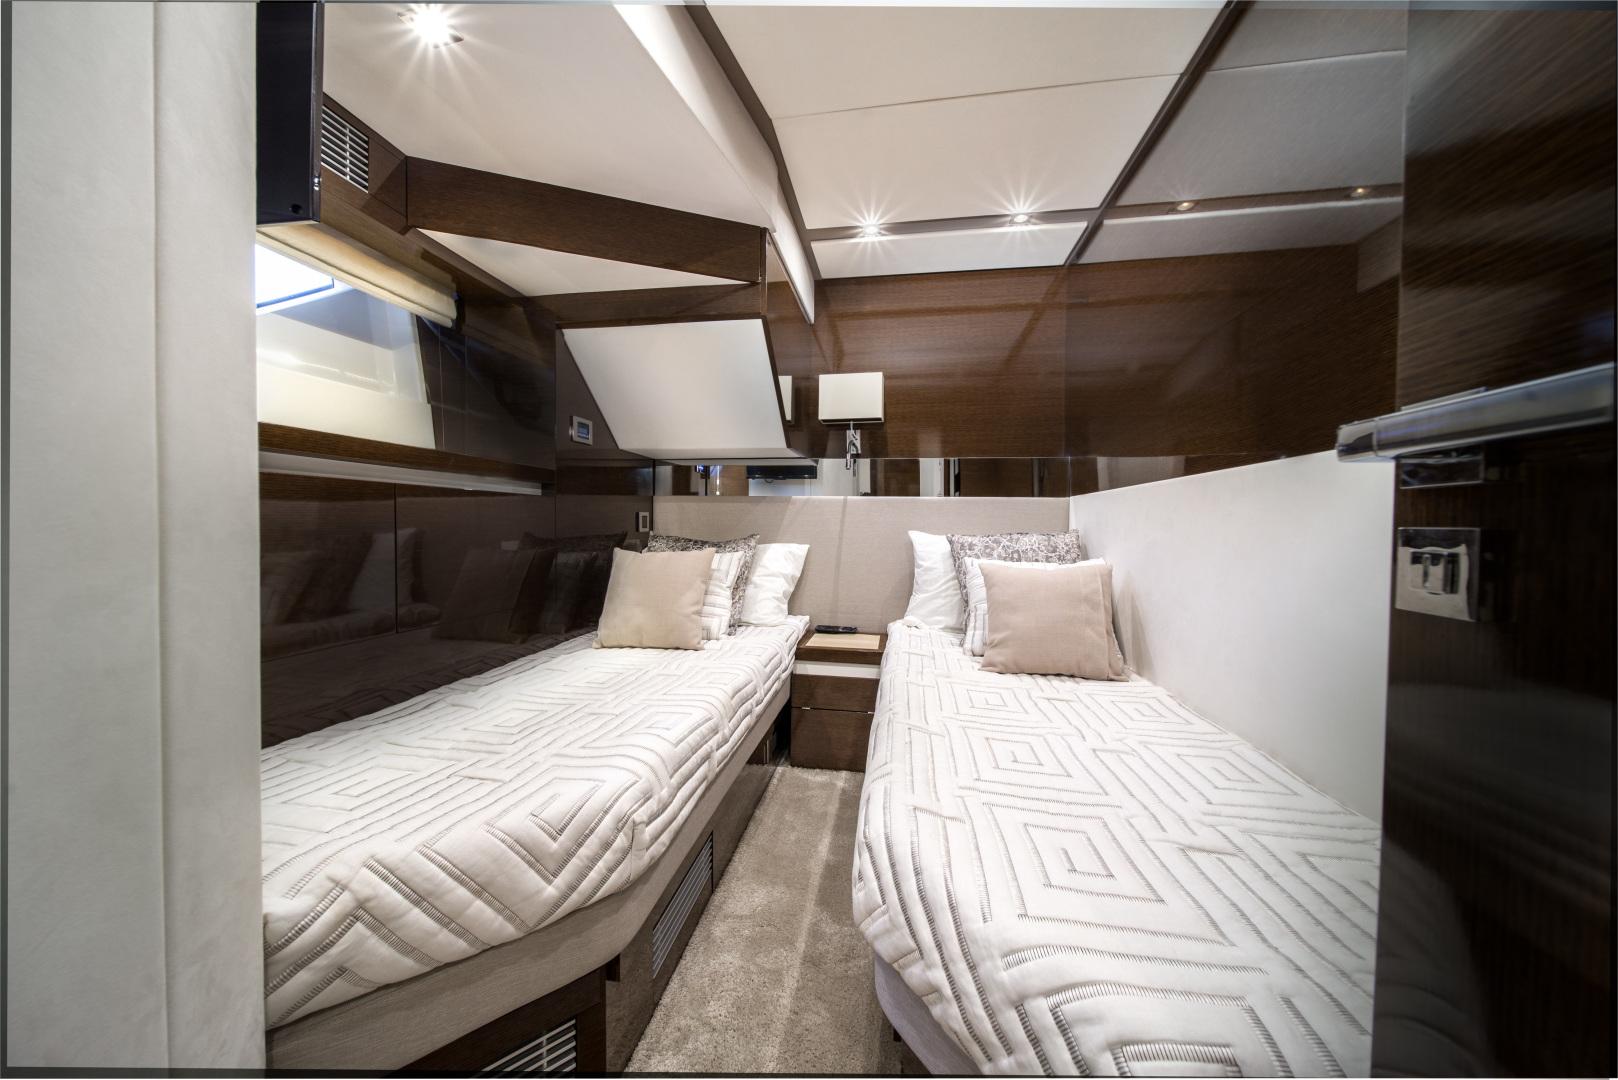 Prestige-680 Flybridge 2018-Seduction Sarasota-Florida-United States-2018 68 Prestige 680 Flybridge  Port Guest Stateroom-1501880 | Thumbnail